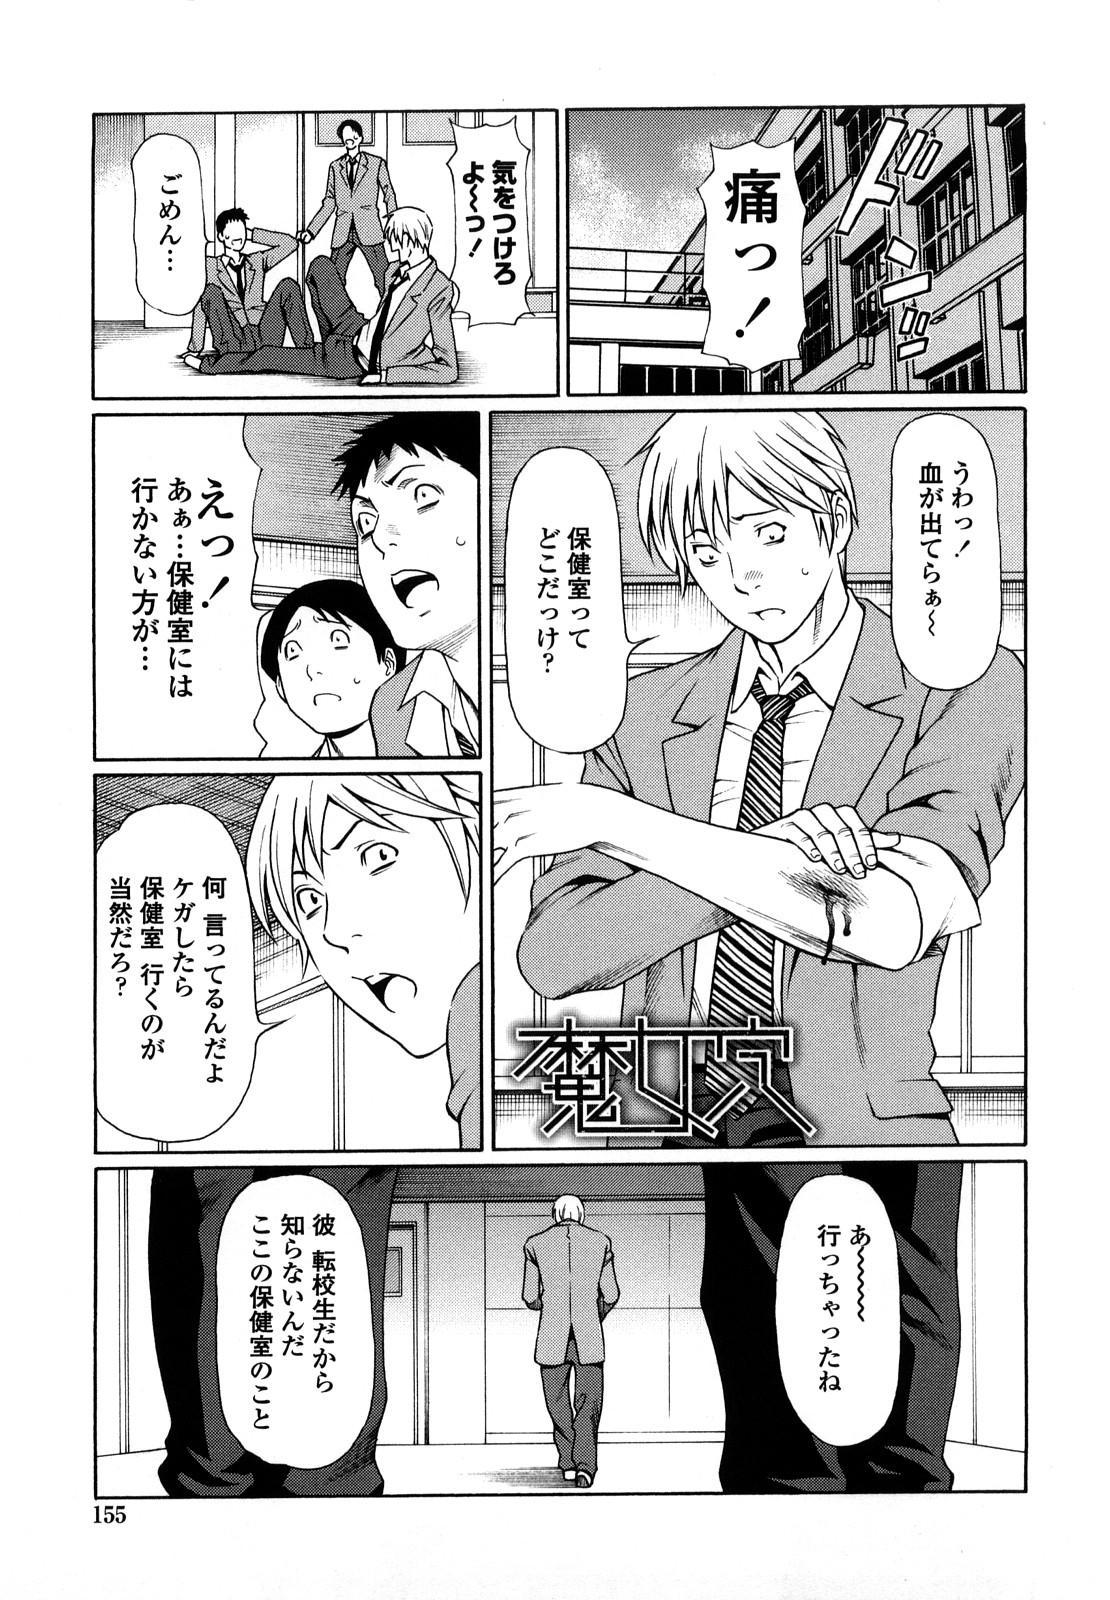 [Takasugi Kou] Kindan no Haha-Ana - Immorality Love-Hole [Decensored] 156